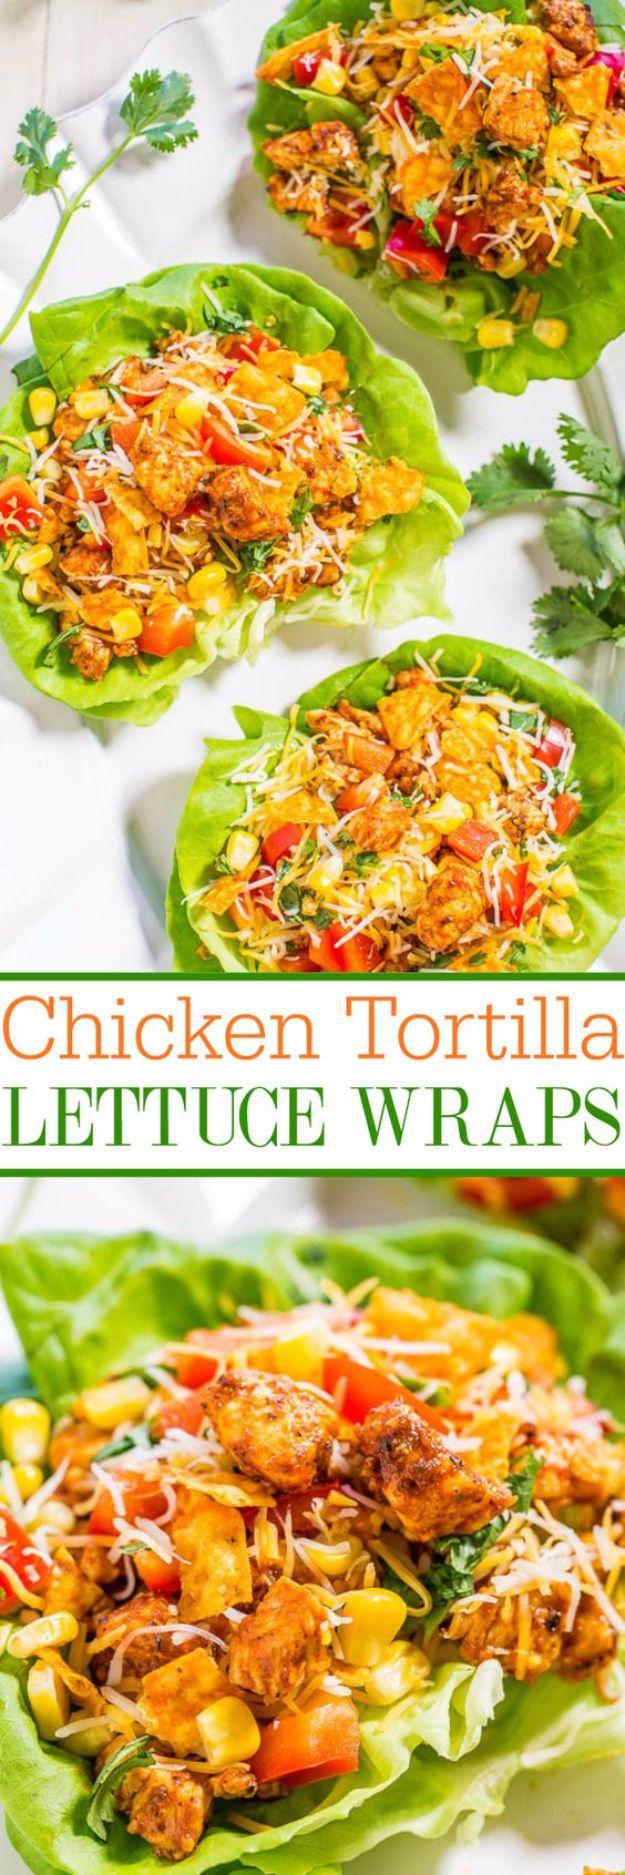 Chicken Tortilla Lettuce Wraps